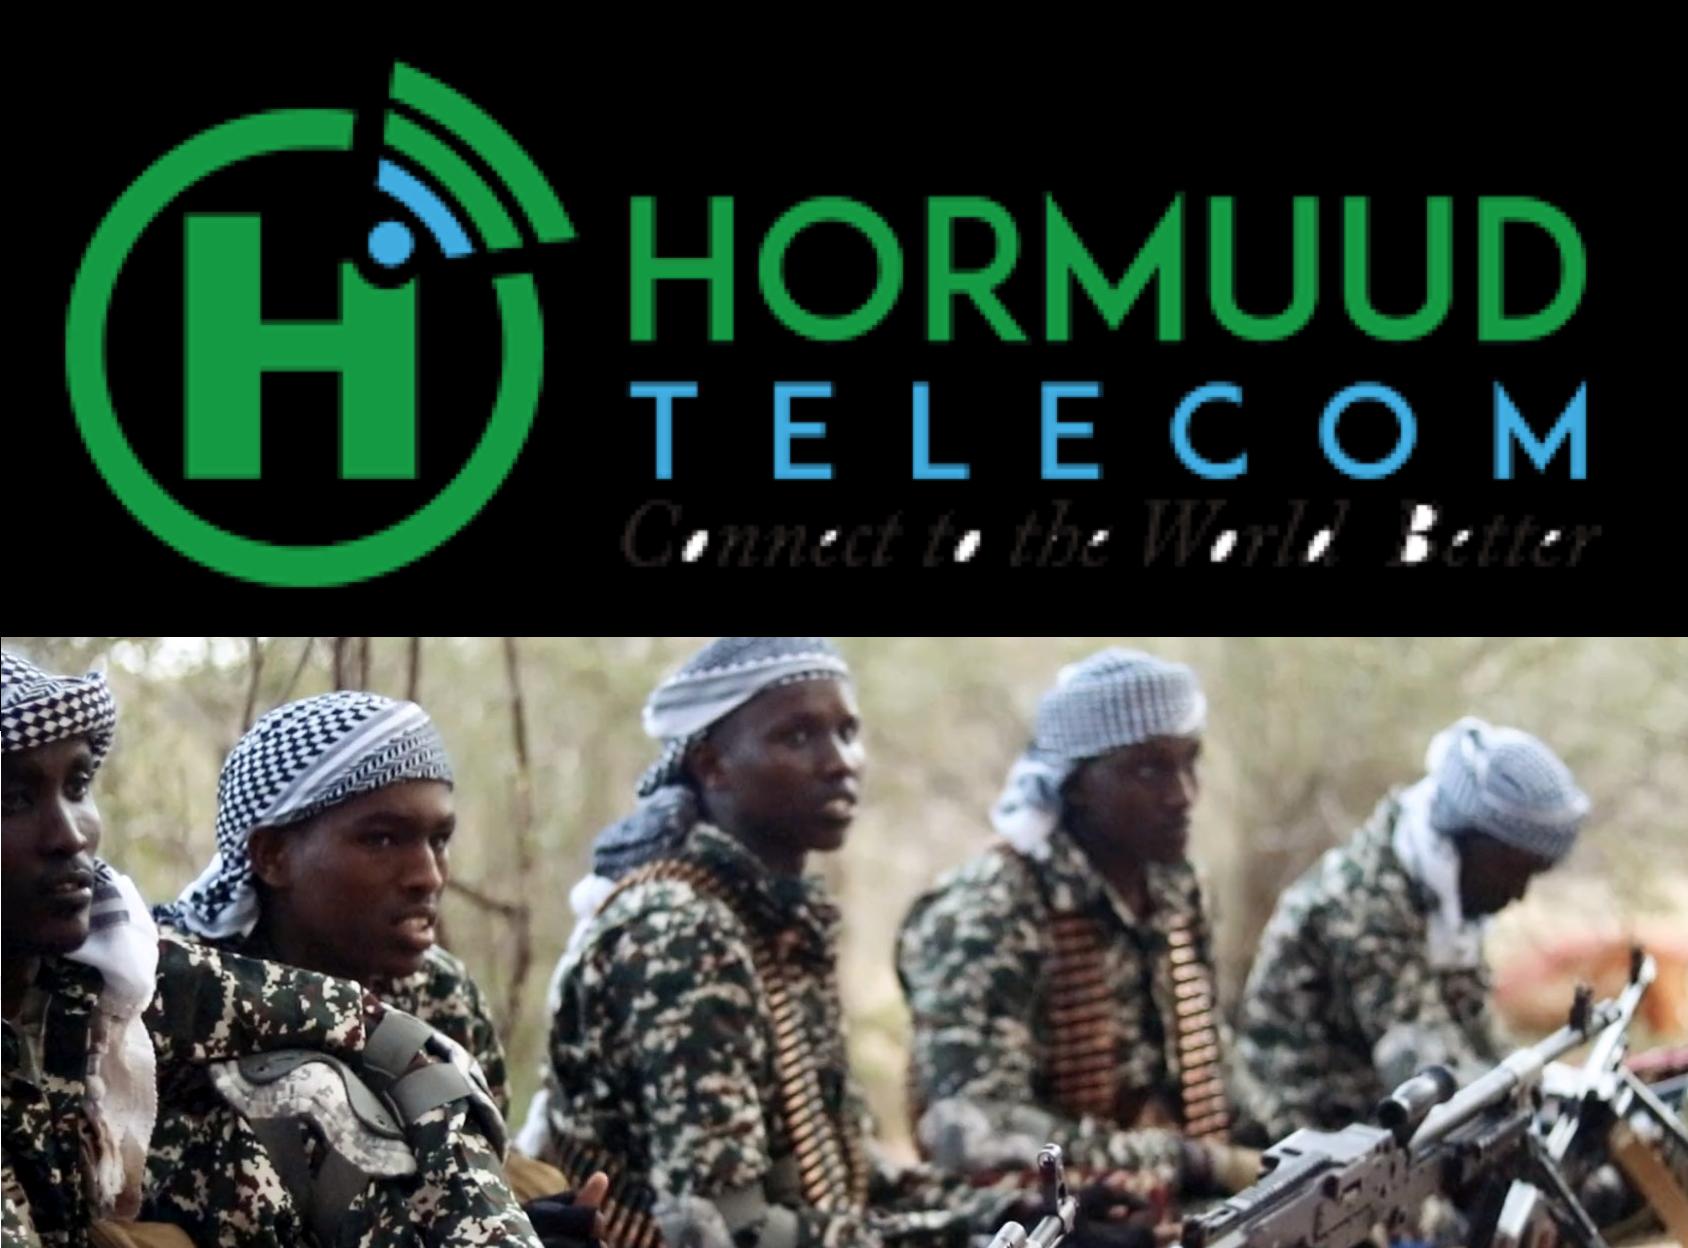 SOMALIA:Al-Shabaab Main Sources of Funding -Hormuud telecom